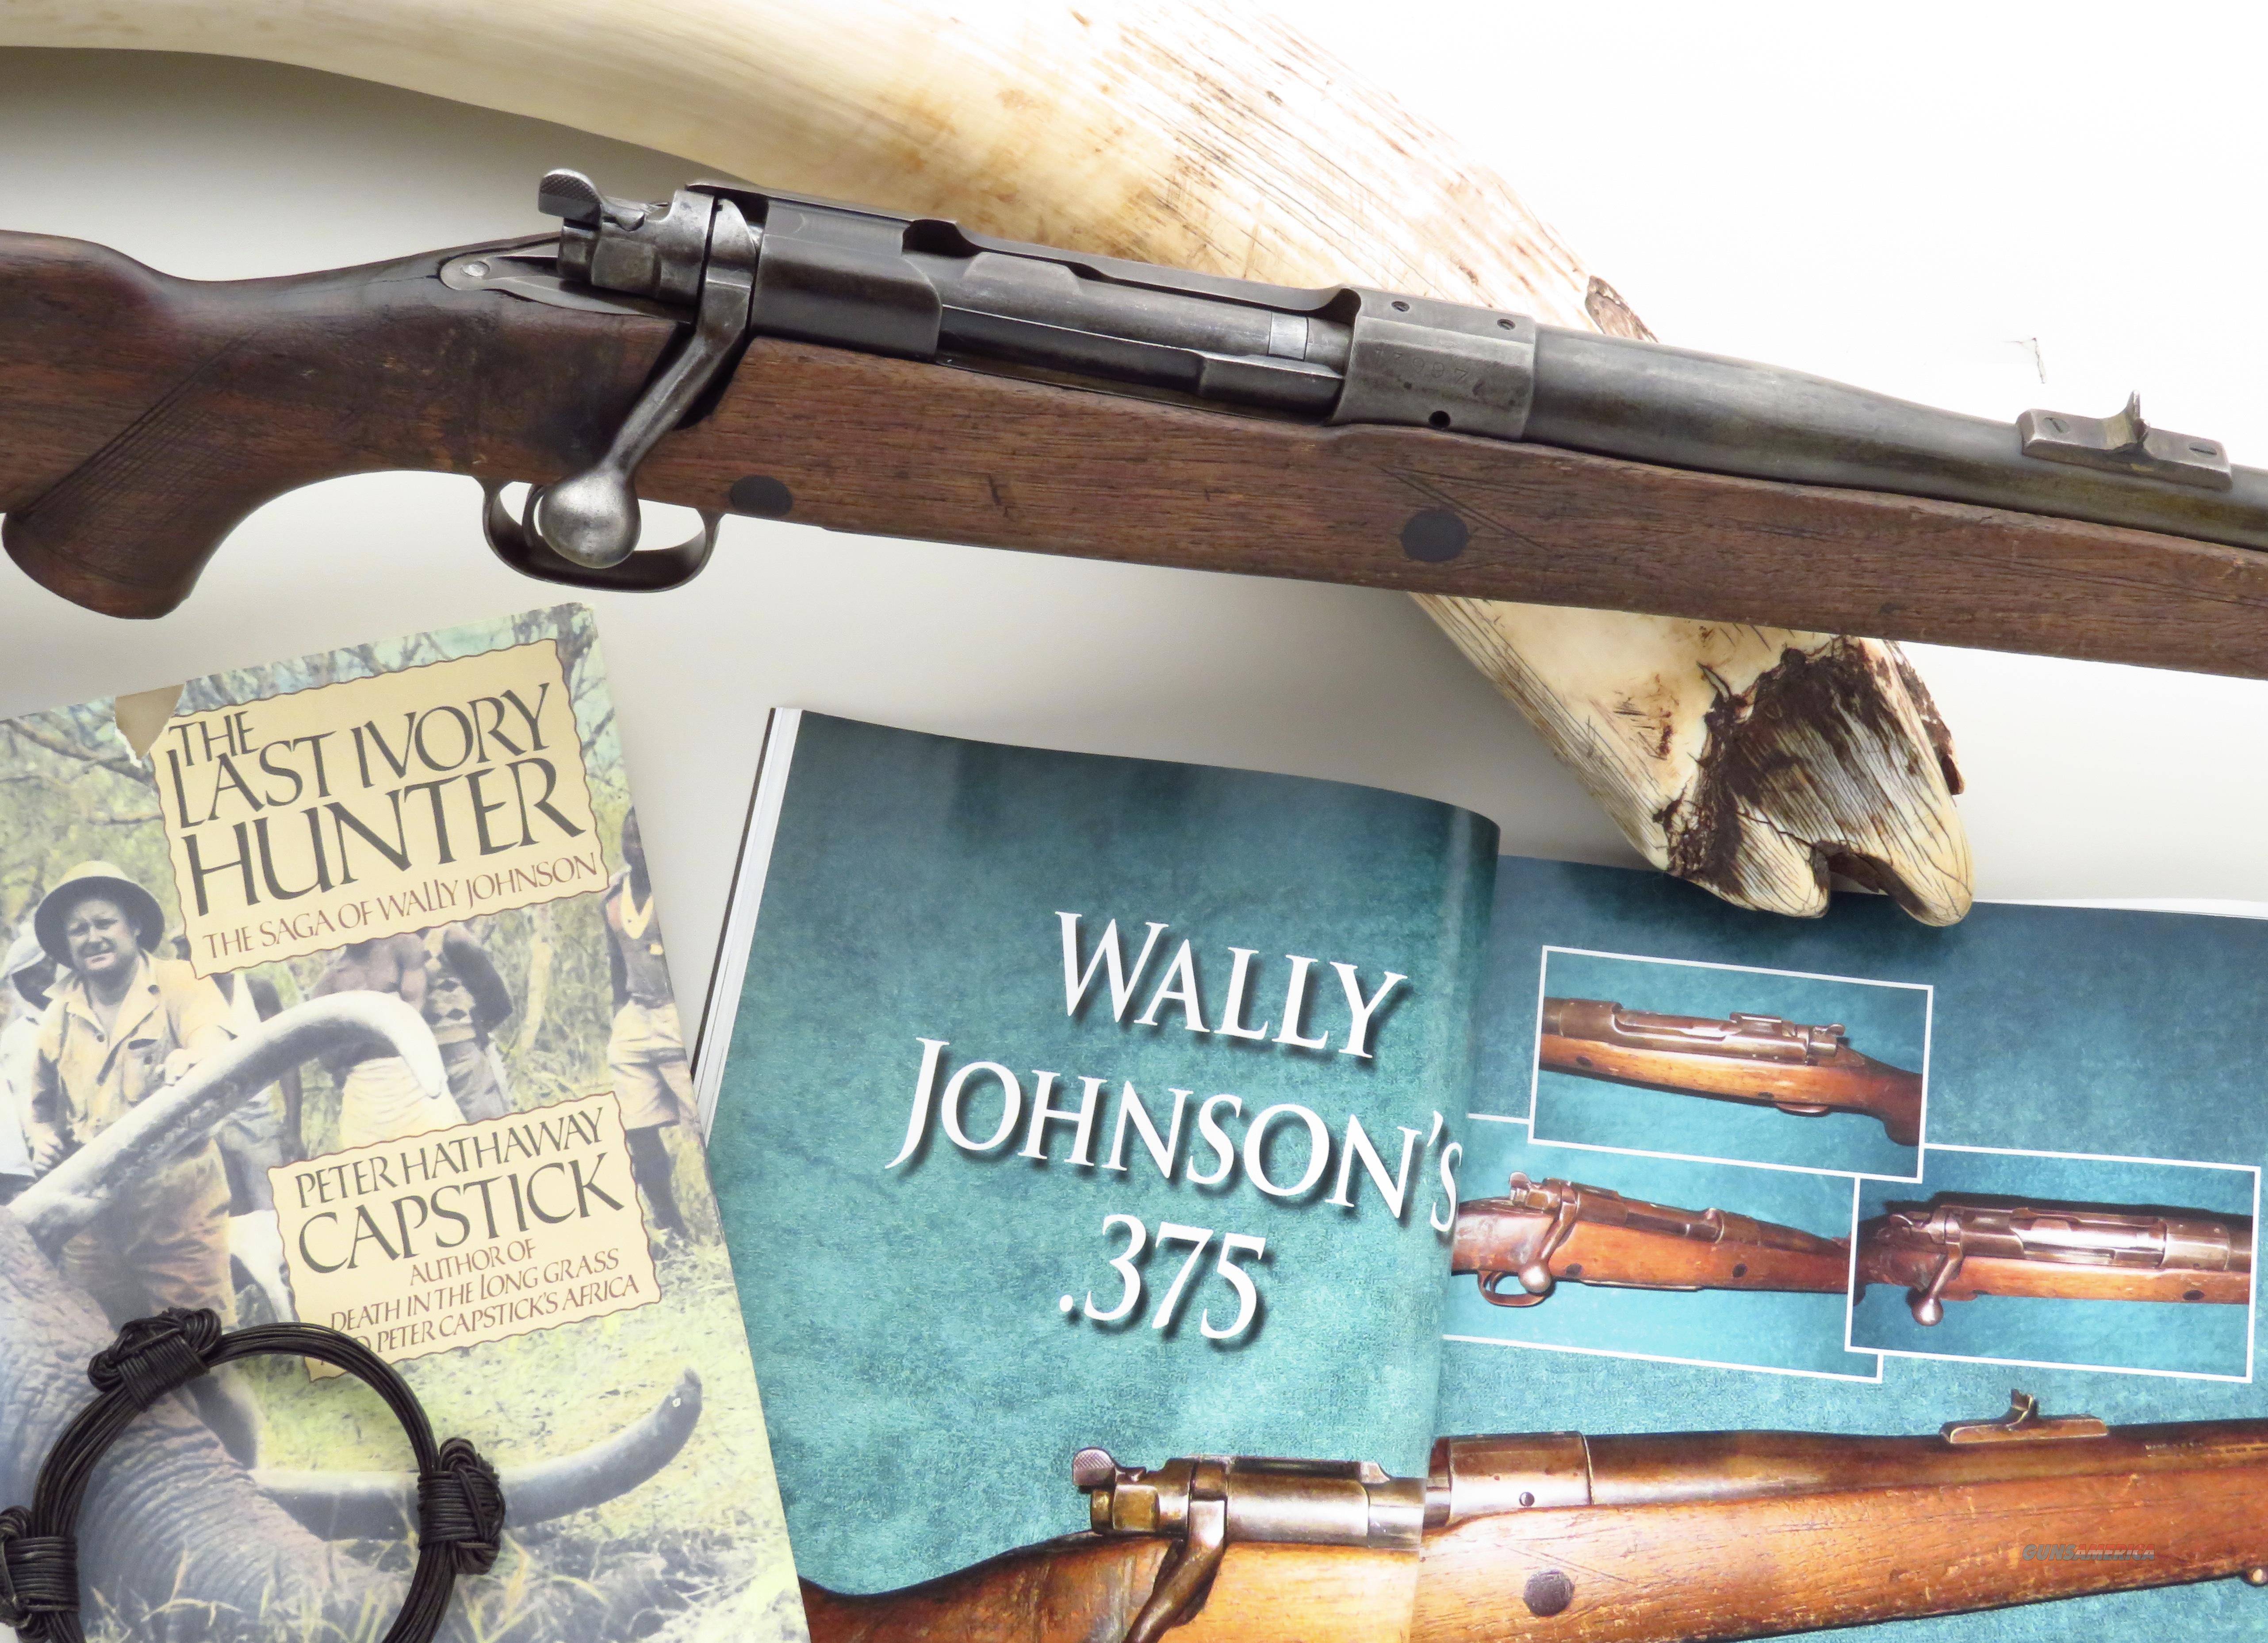 "Wally Johnson's (Capstick's ""Last Ivory Hunter"") Pre-war .375 H&H elephant rifle  Guns > Rifles > Winchester Rifles - Modern Bolt/Auto/Single > Model 70 > Pre-64"